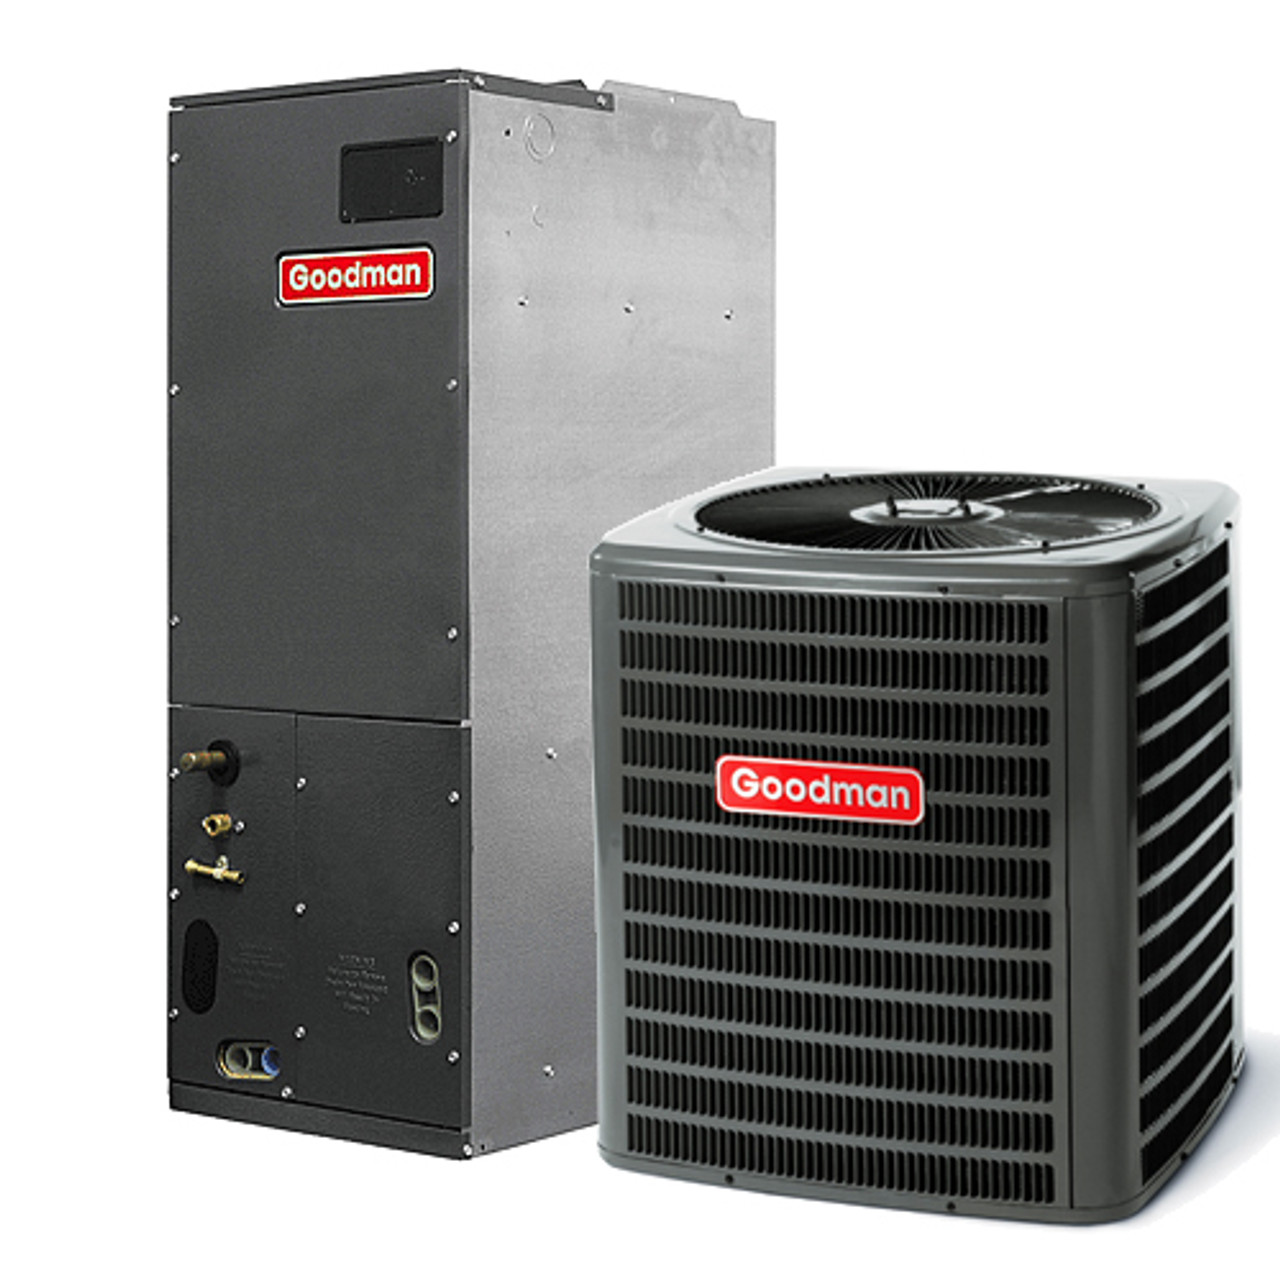 Goodman 2 1 2 Ton 15 Seer Heat Pump Gsz140301 Aspt37c14